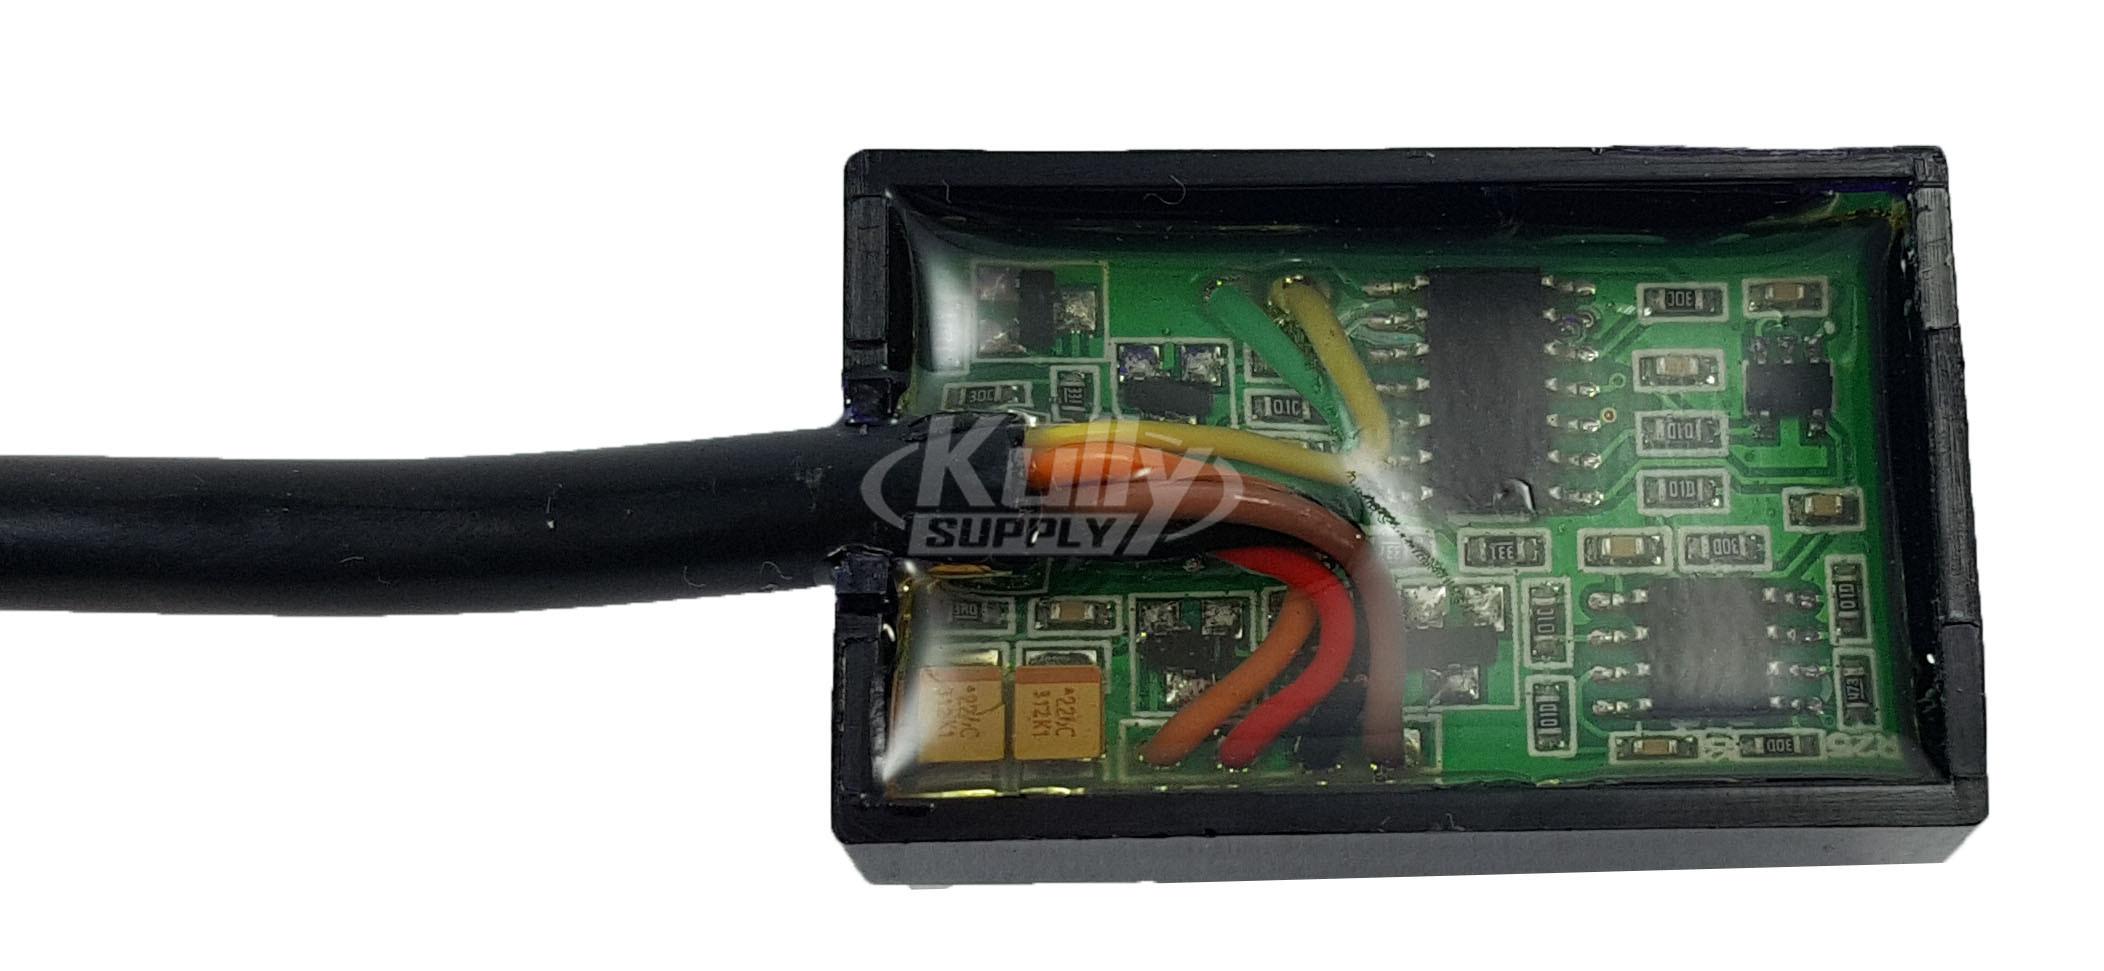 Sloan SFP-41-A Sensor w/ Adjustable Range 6 Pin | KullySupply.com